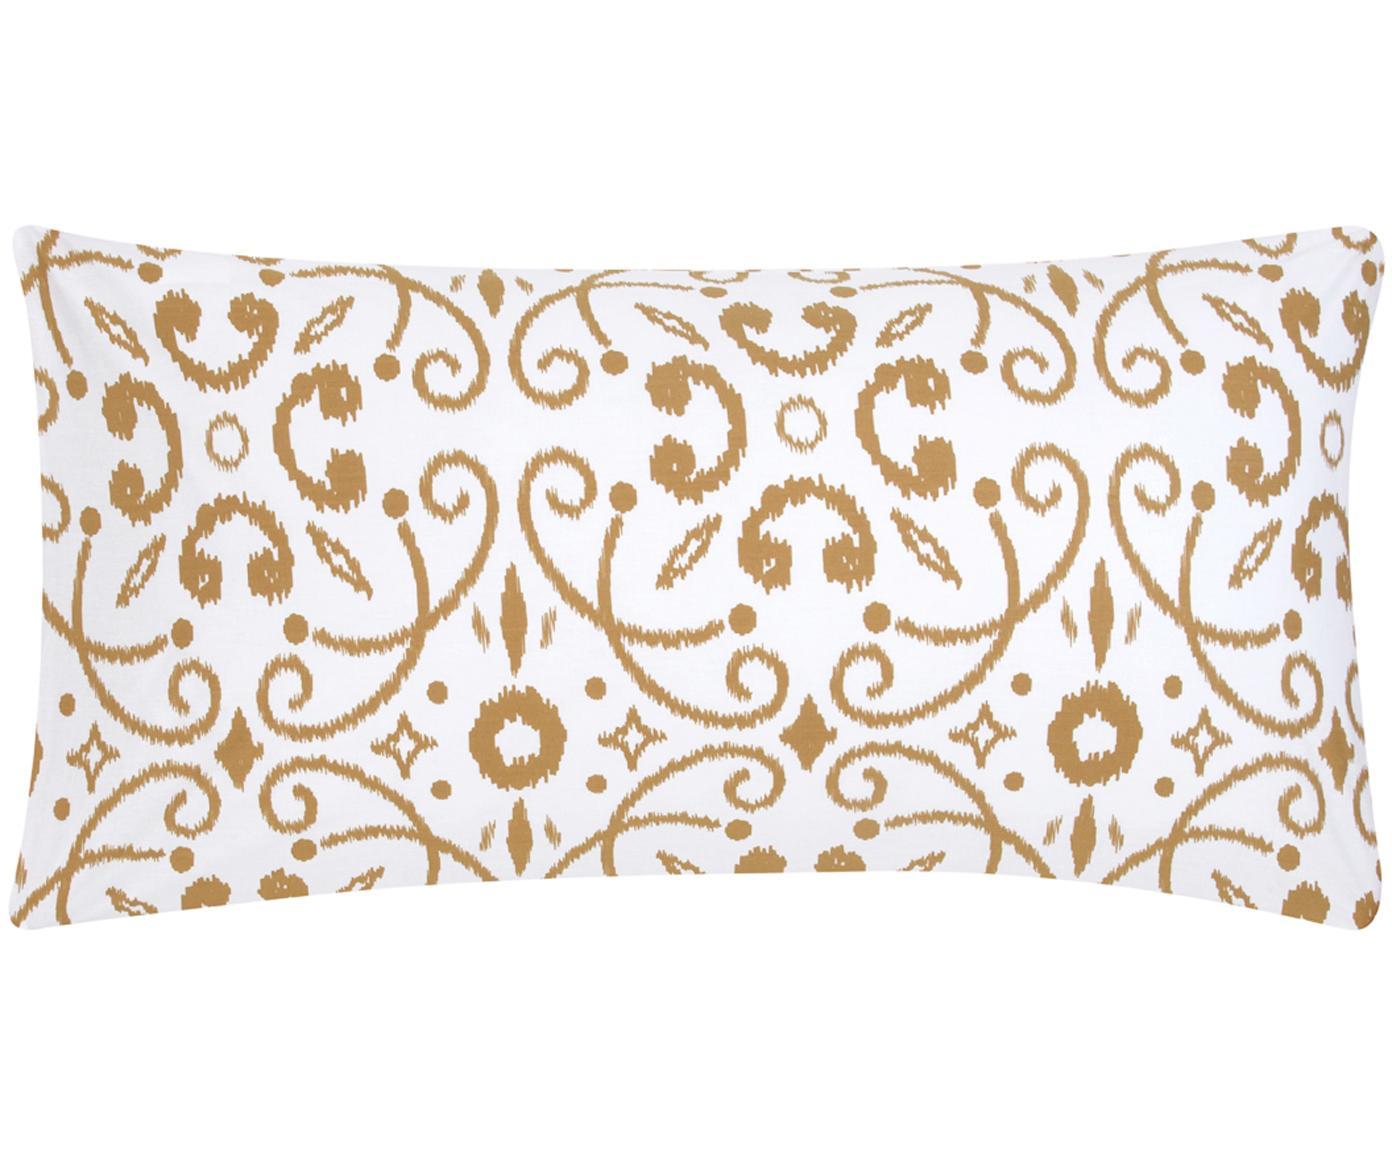 Poszewka na poduszkę z perkalu Antje, 2 szt., Biały, musztardowy, S 40 x D 80 cm